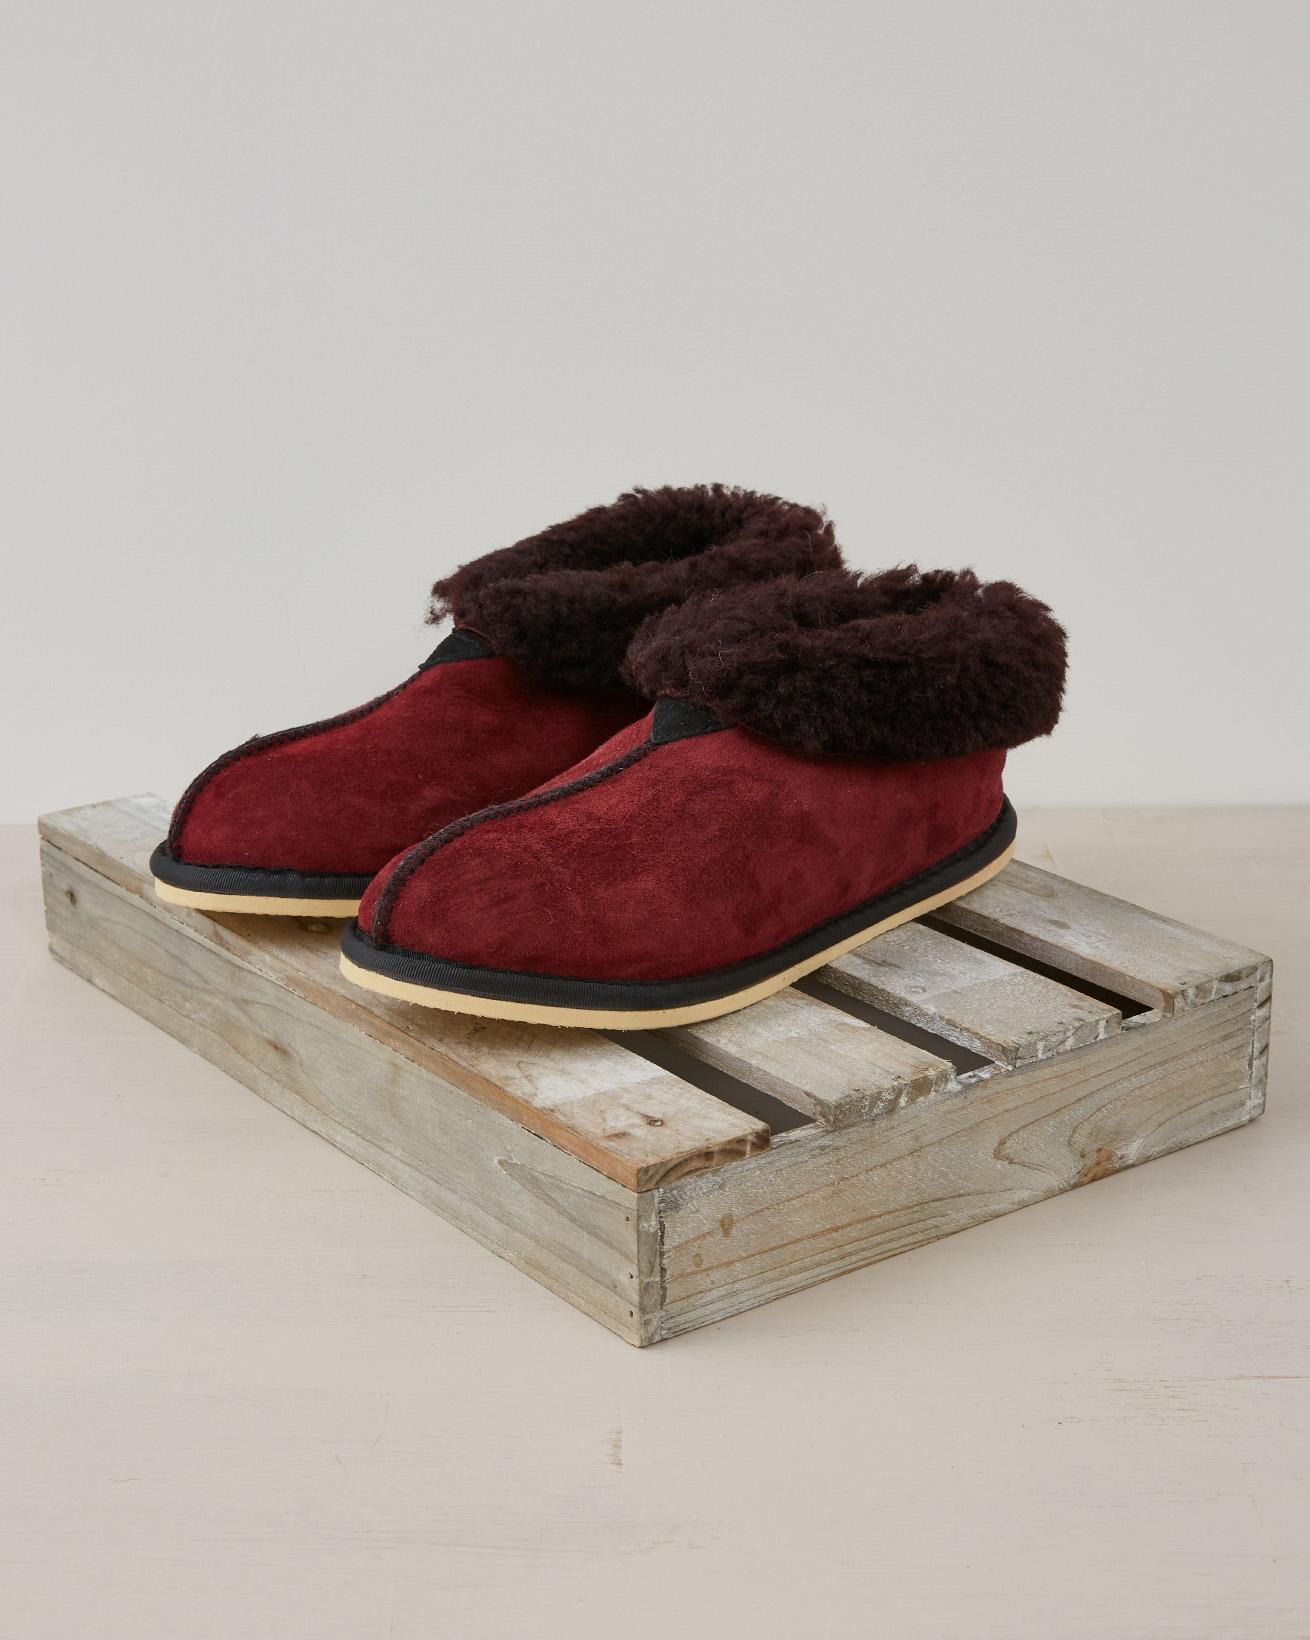 Ladies bootee slipper - Size 6 - Claret - 2388